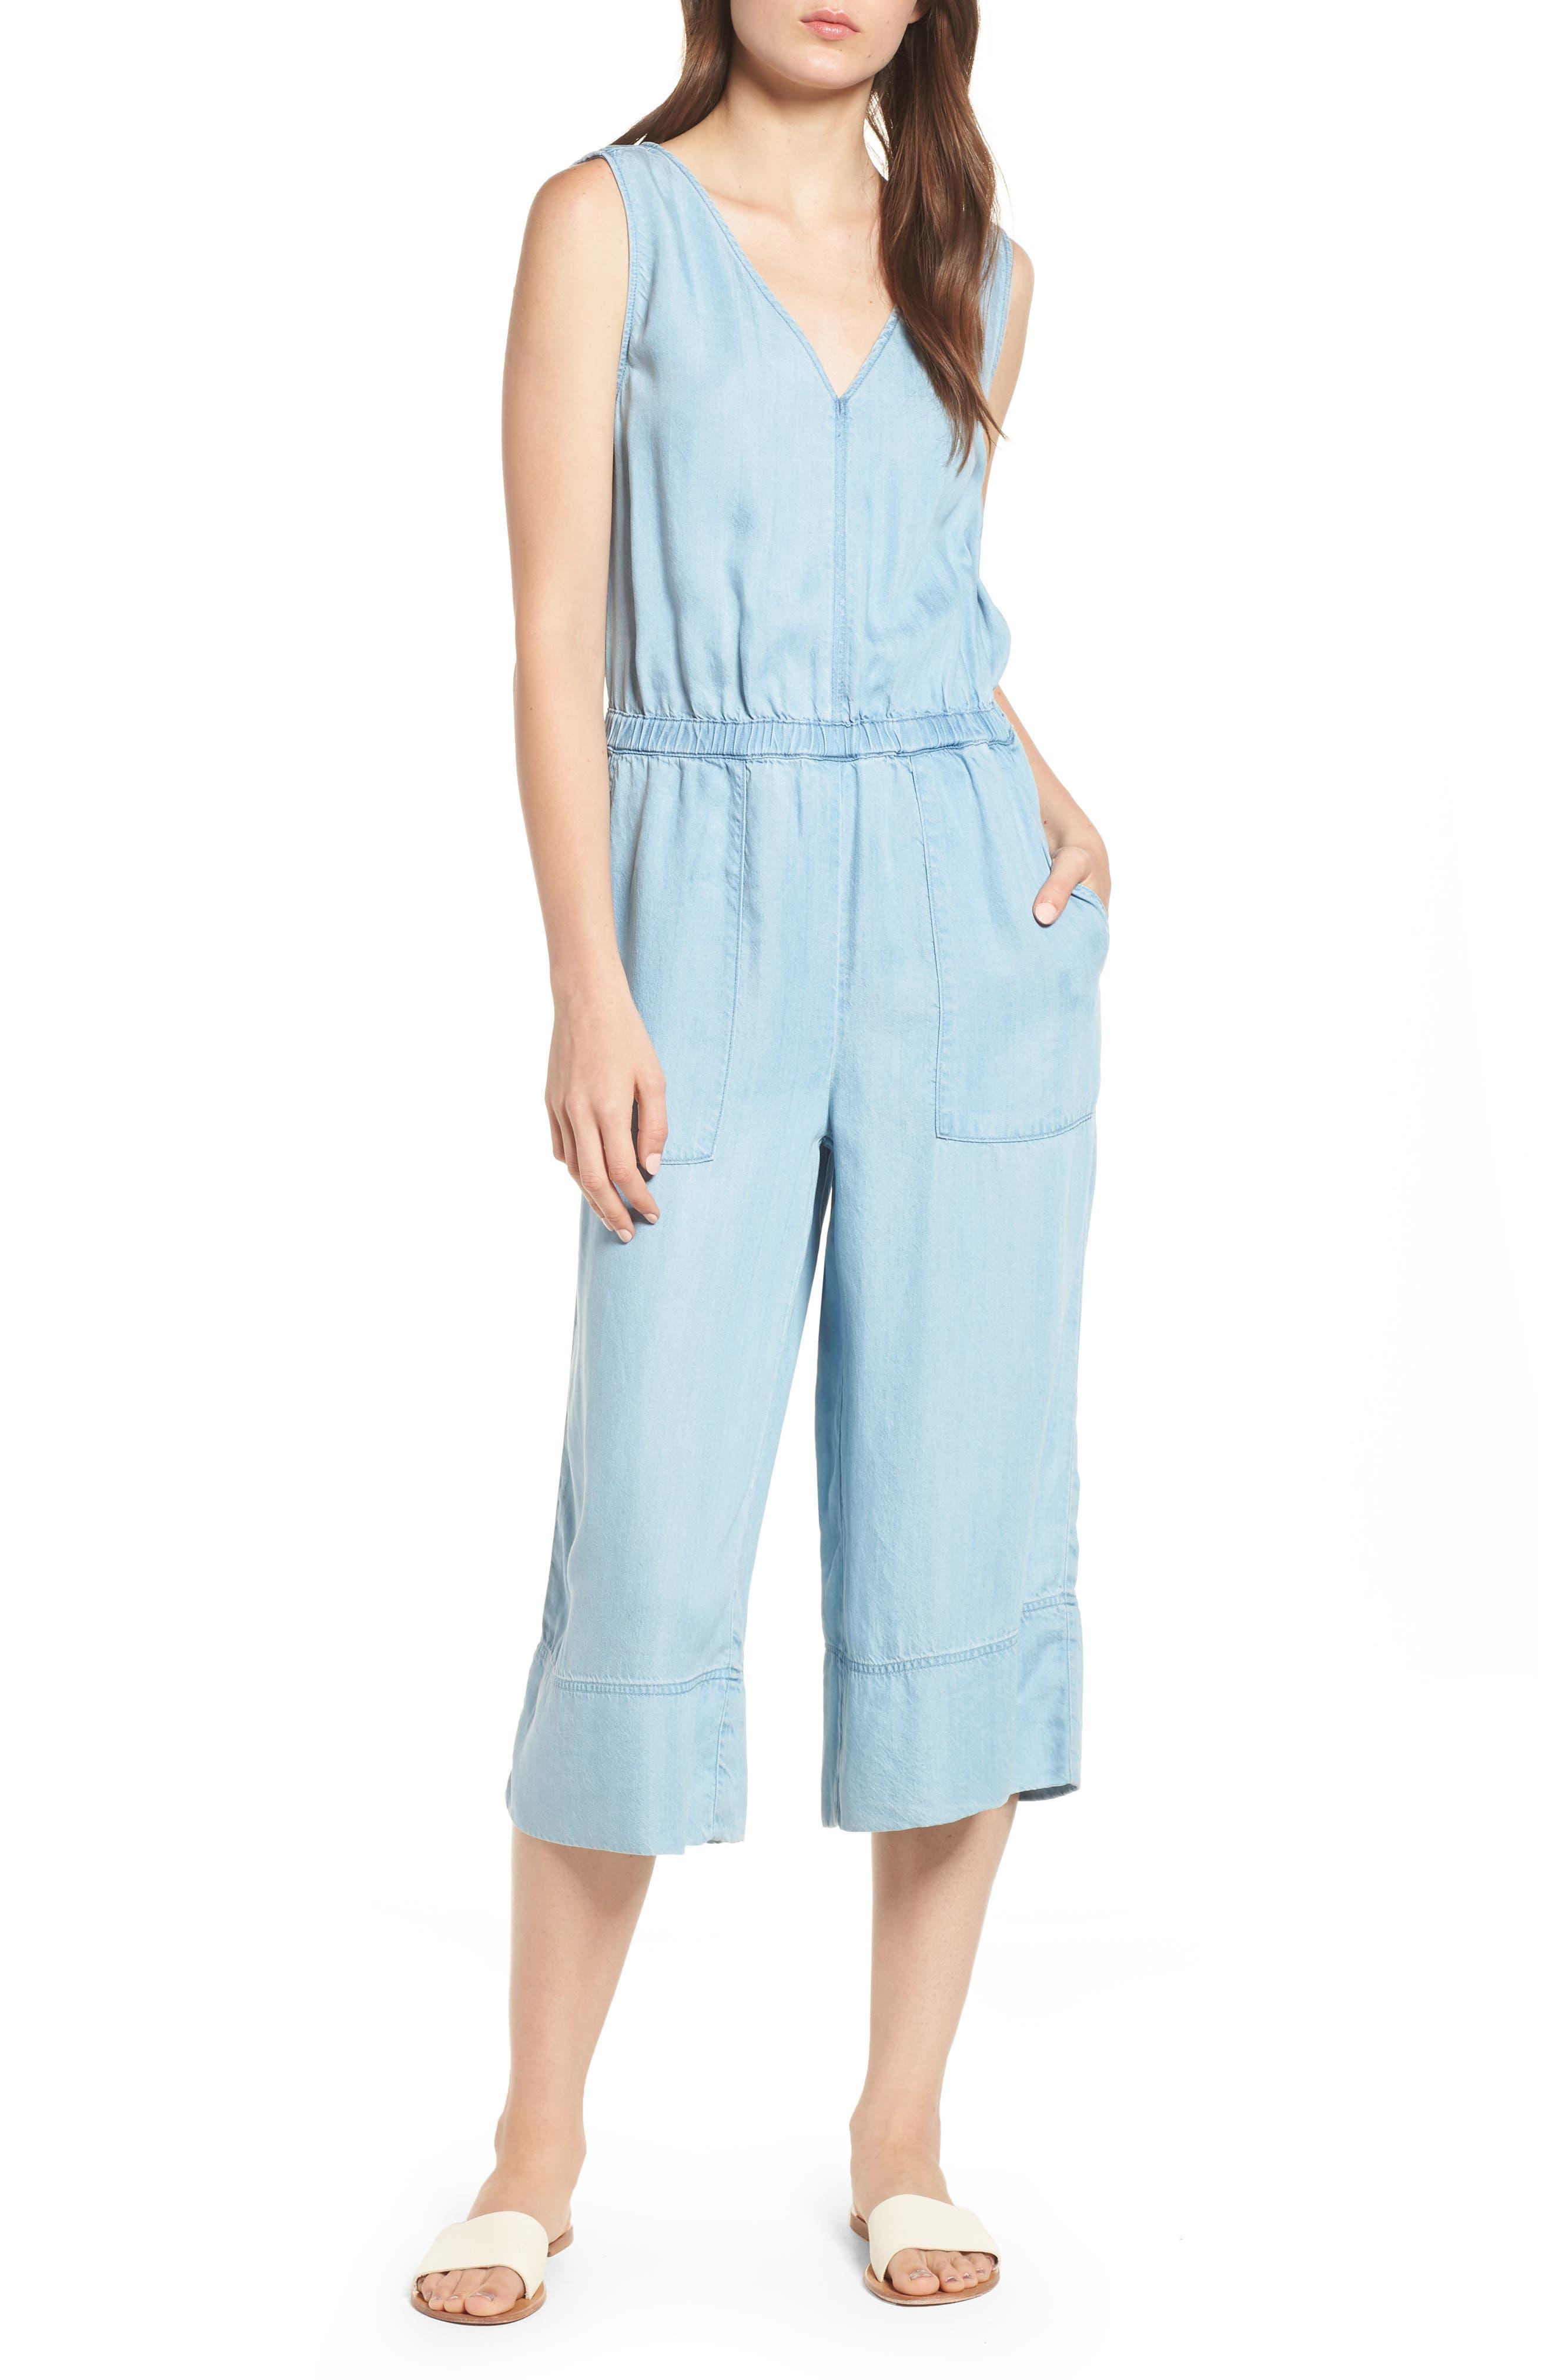 Splendid Culotte Jumpsuit